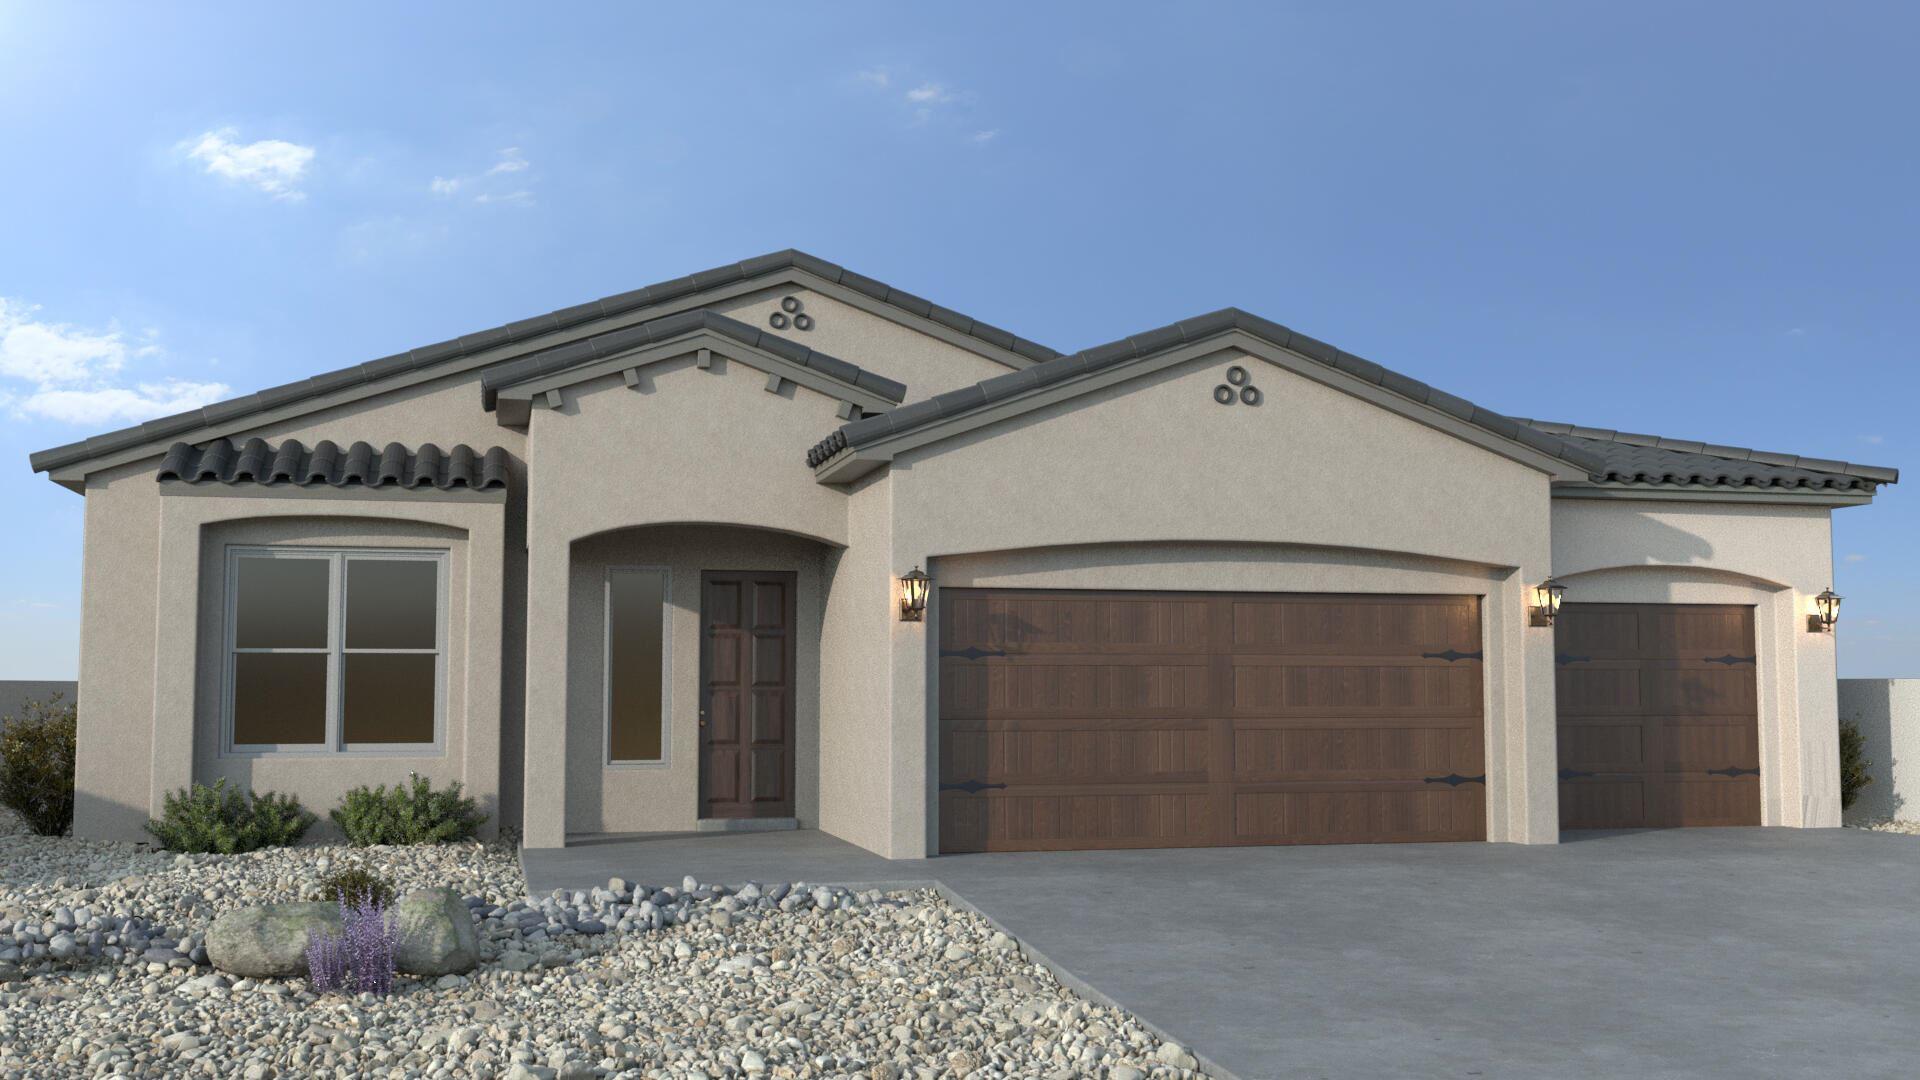 115828 RODEY Avenue SE, Albuquerque, NM 87123 - #: 1000810